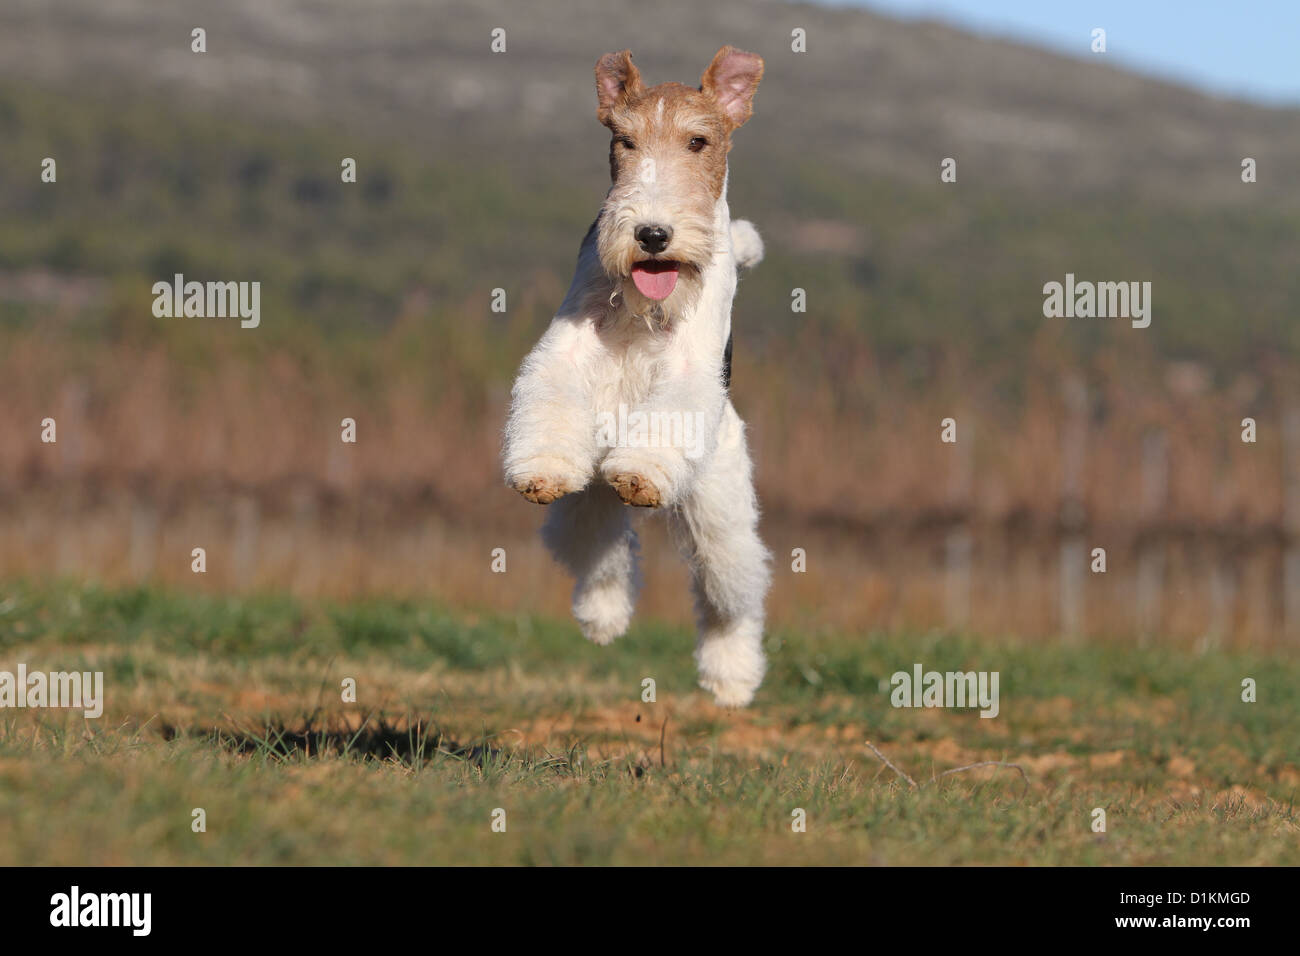 Fox Terrier Stockfotos & Fox Terrier Bilder - Alamy